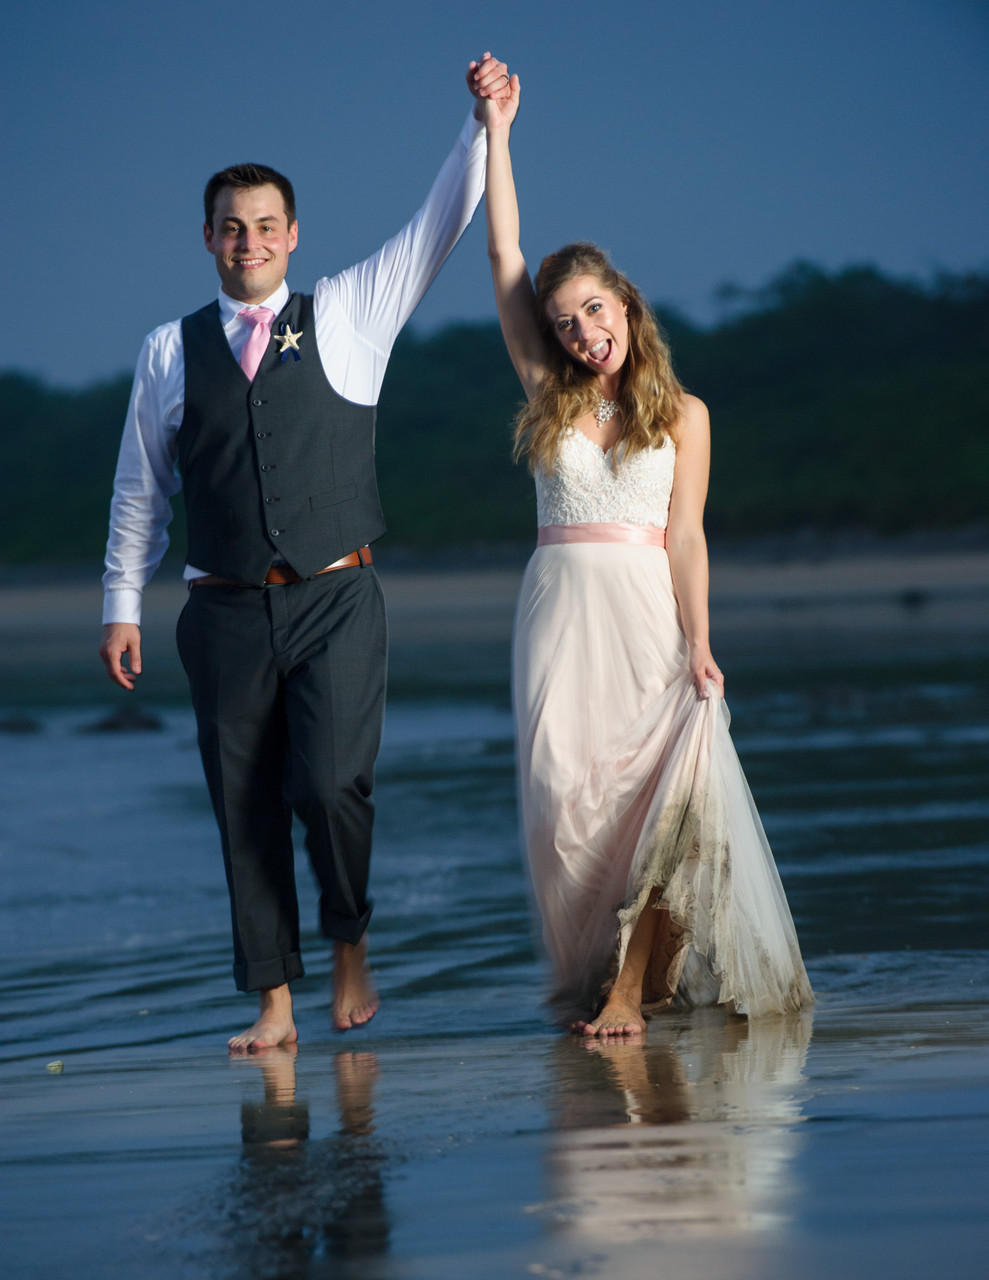 Bride and groom stroll on the beach in Hacienda Pinilla